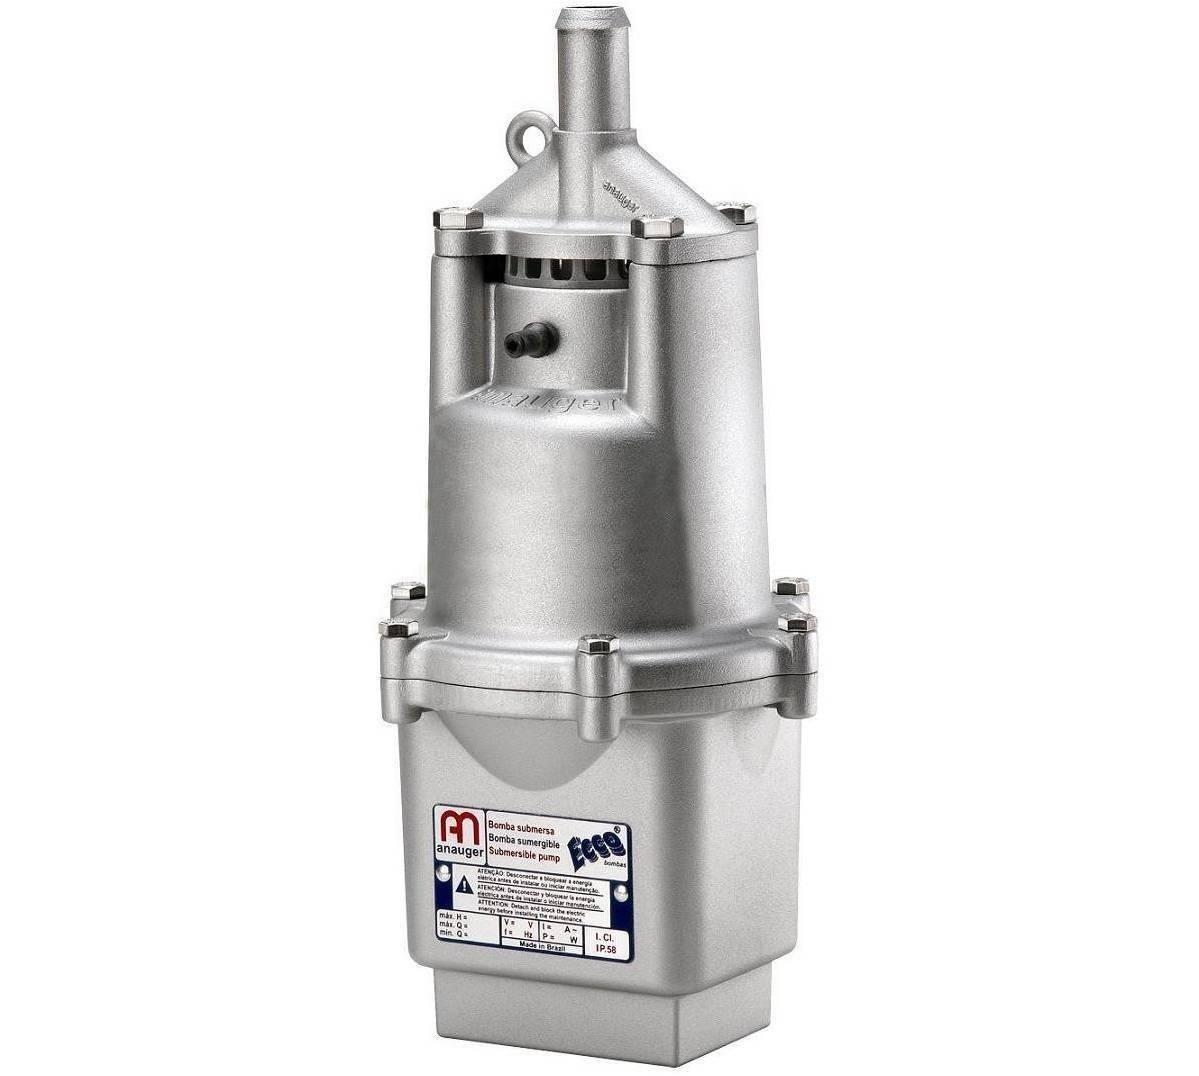 Bomba D´agua Submersa Vibratória Anauger Ecco 1400/hora + Chave Bóia de Nível 110 Volts